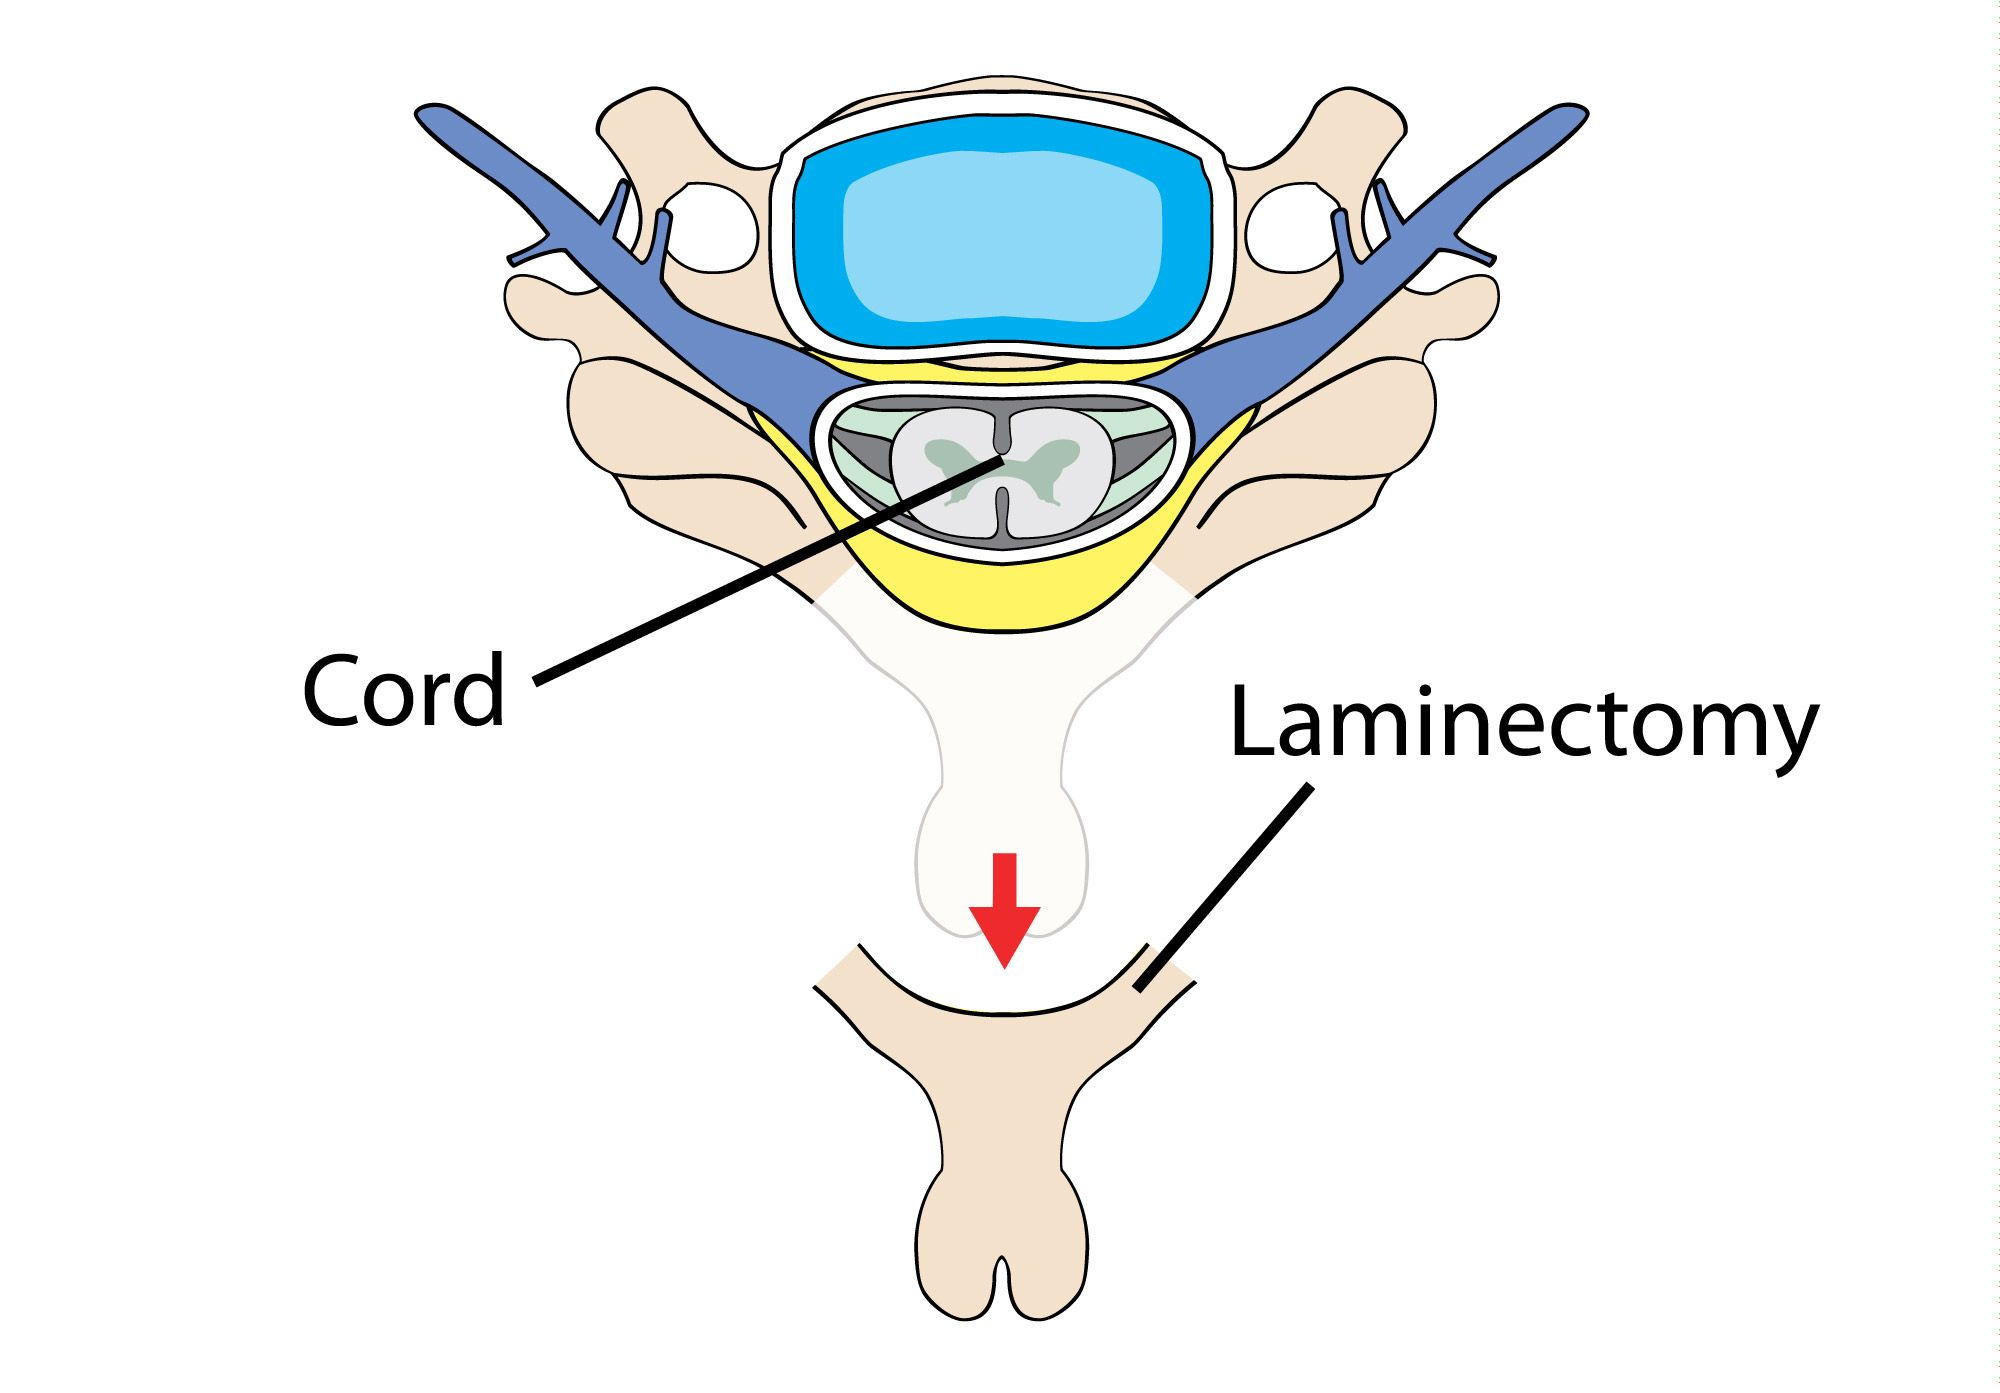 illustration of the laminectomy procedure